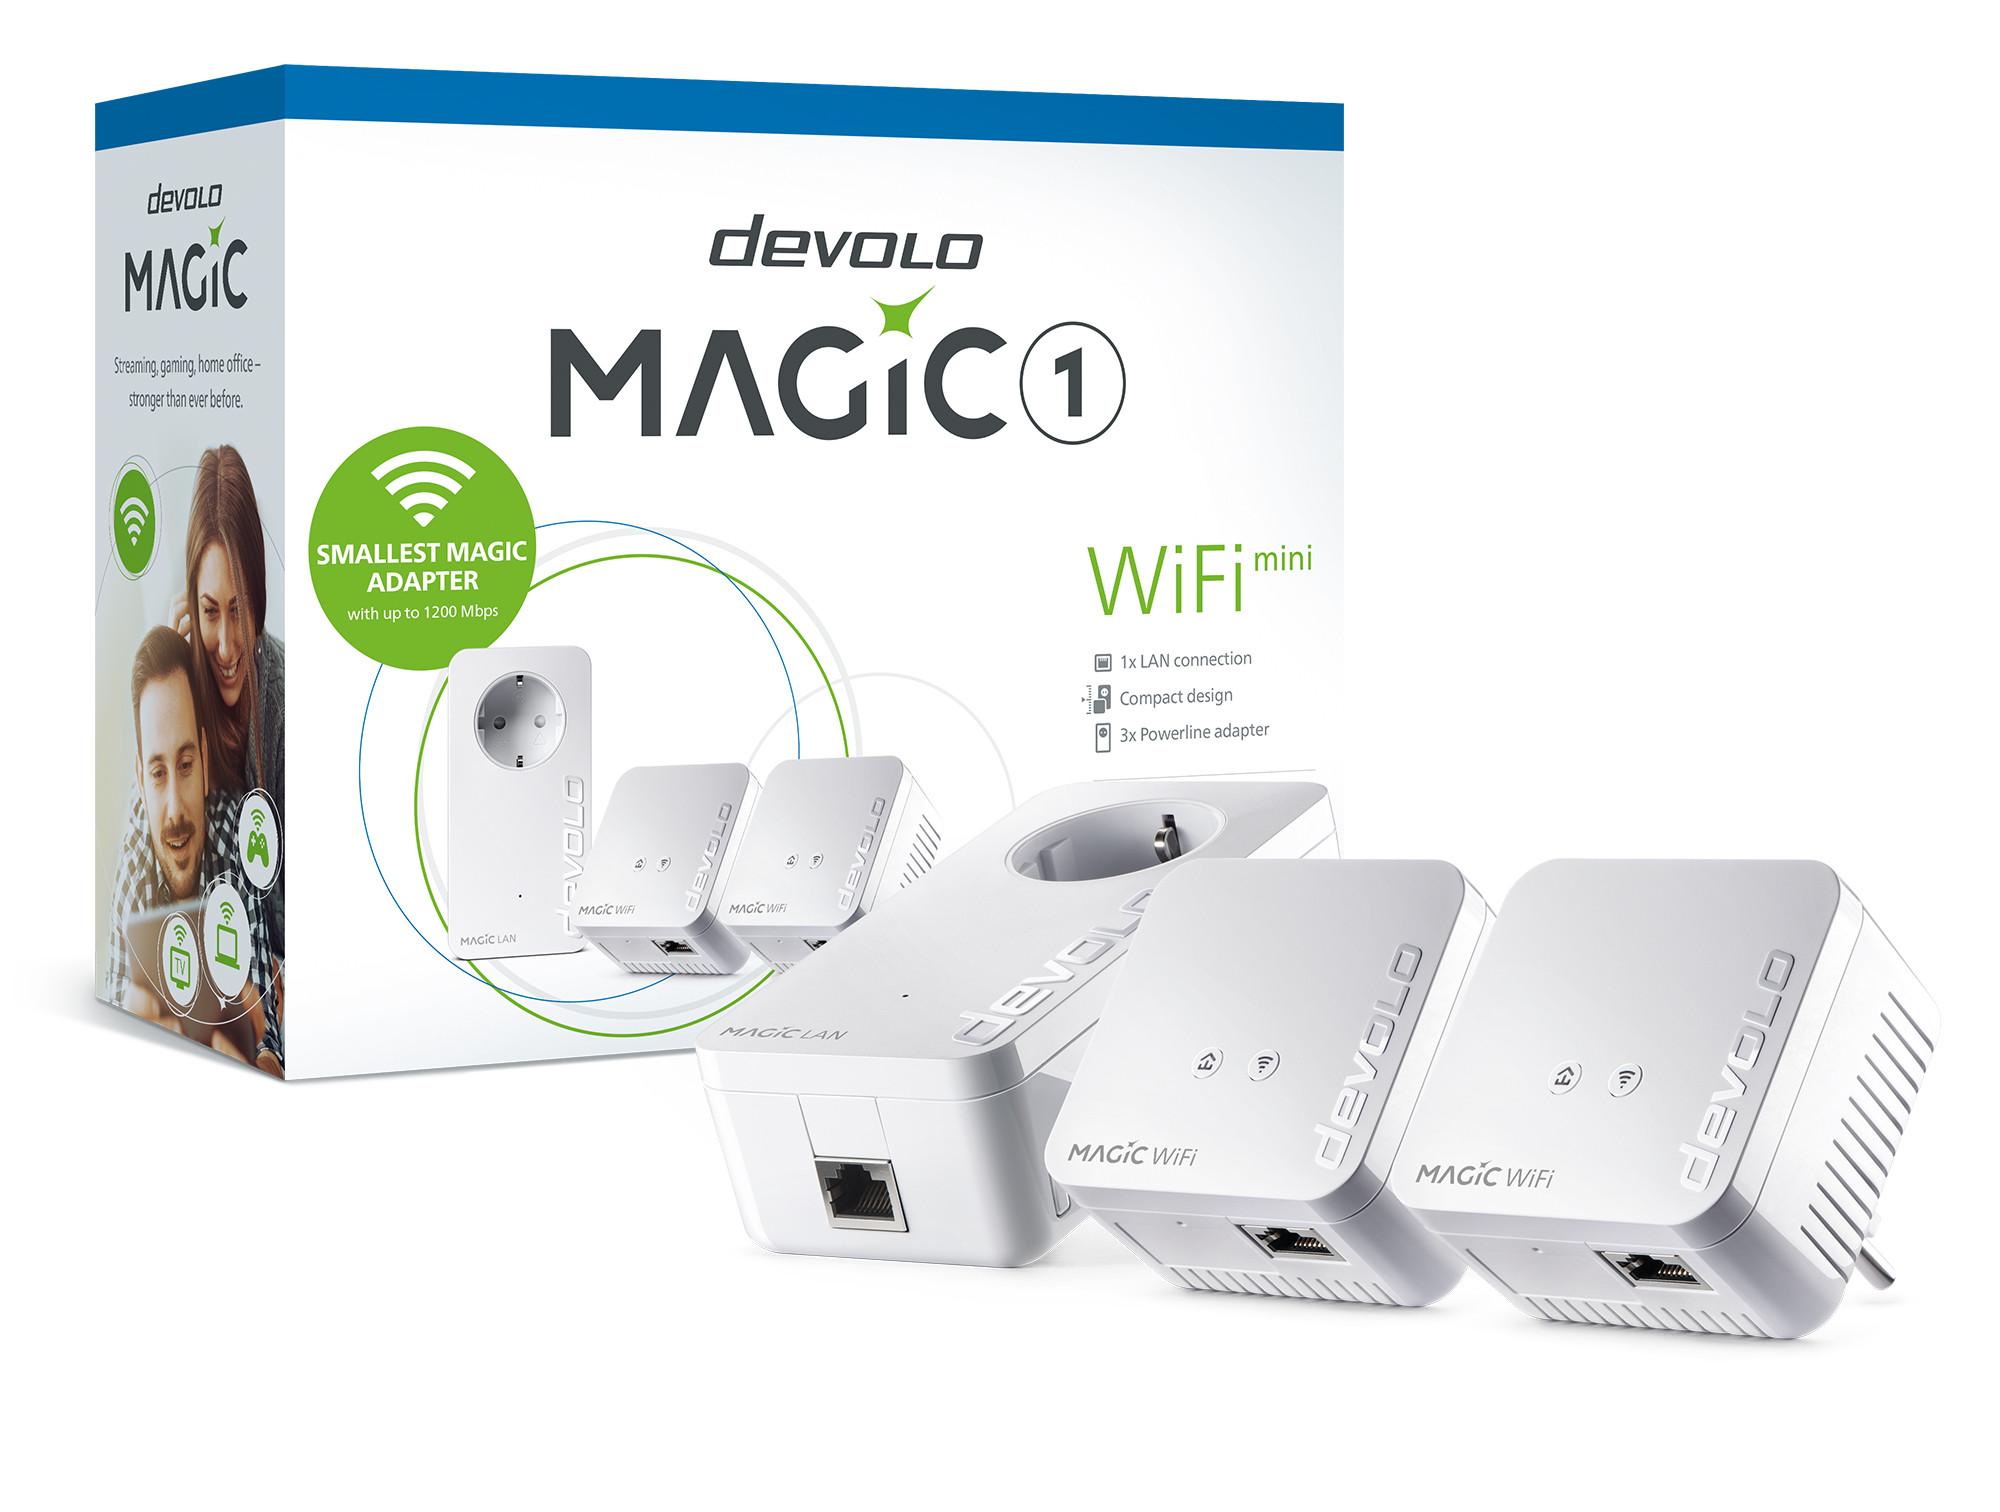 devolo Magic 1 WiFi mini Multiroom Kit_1.jpg